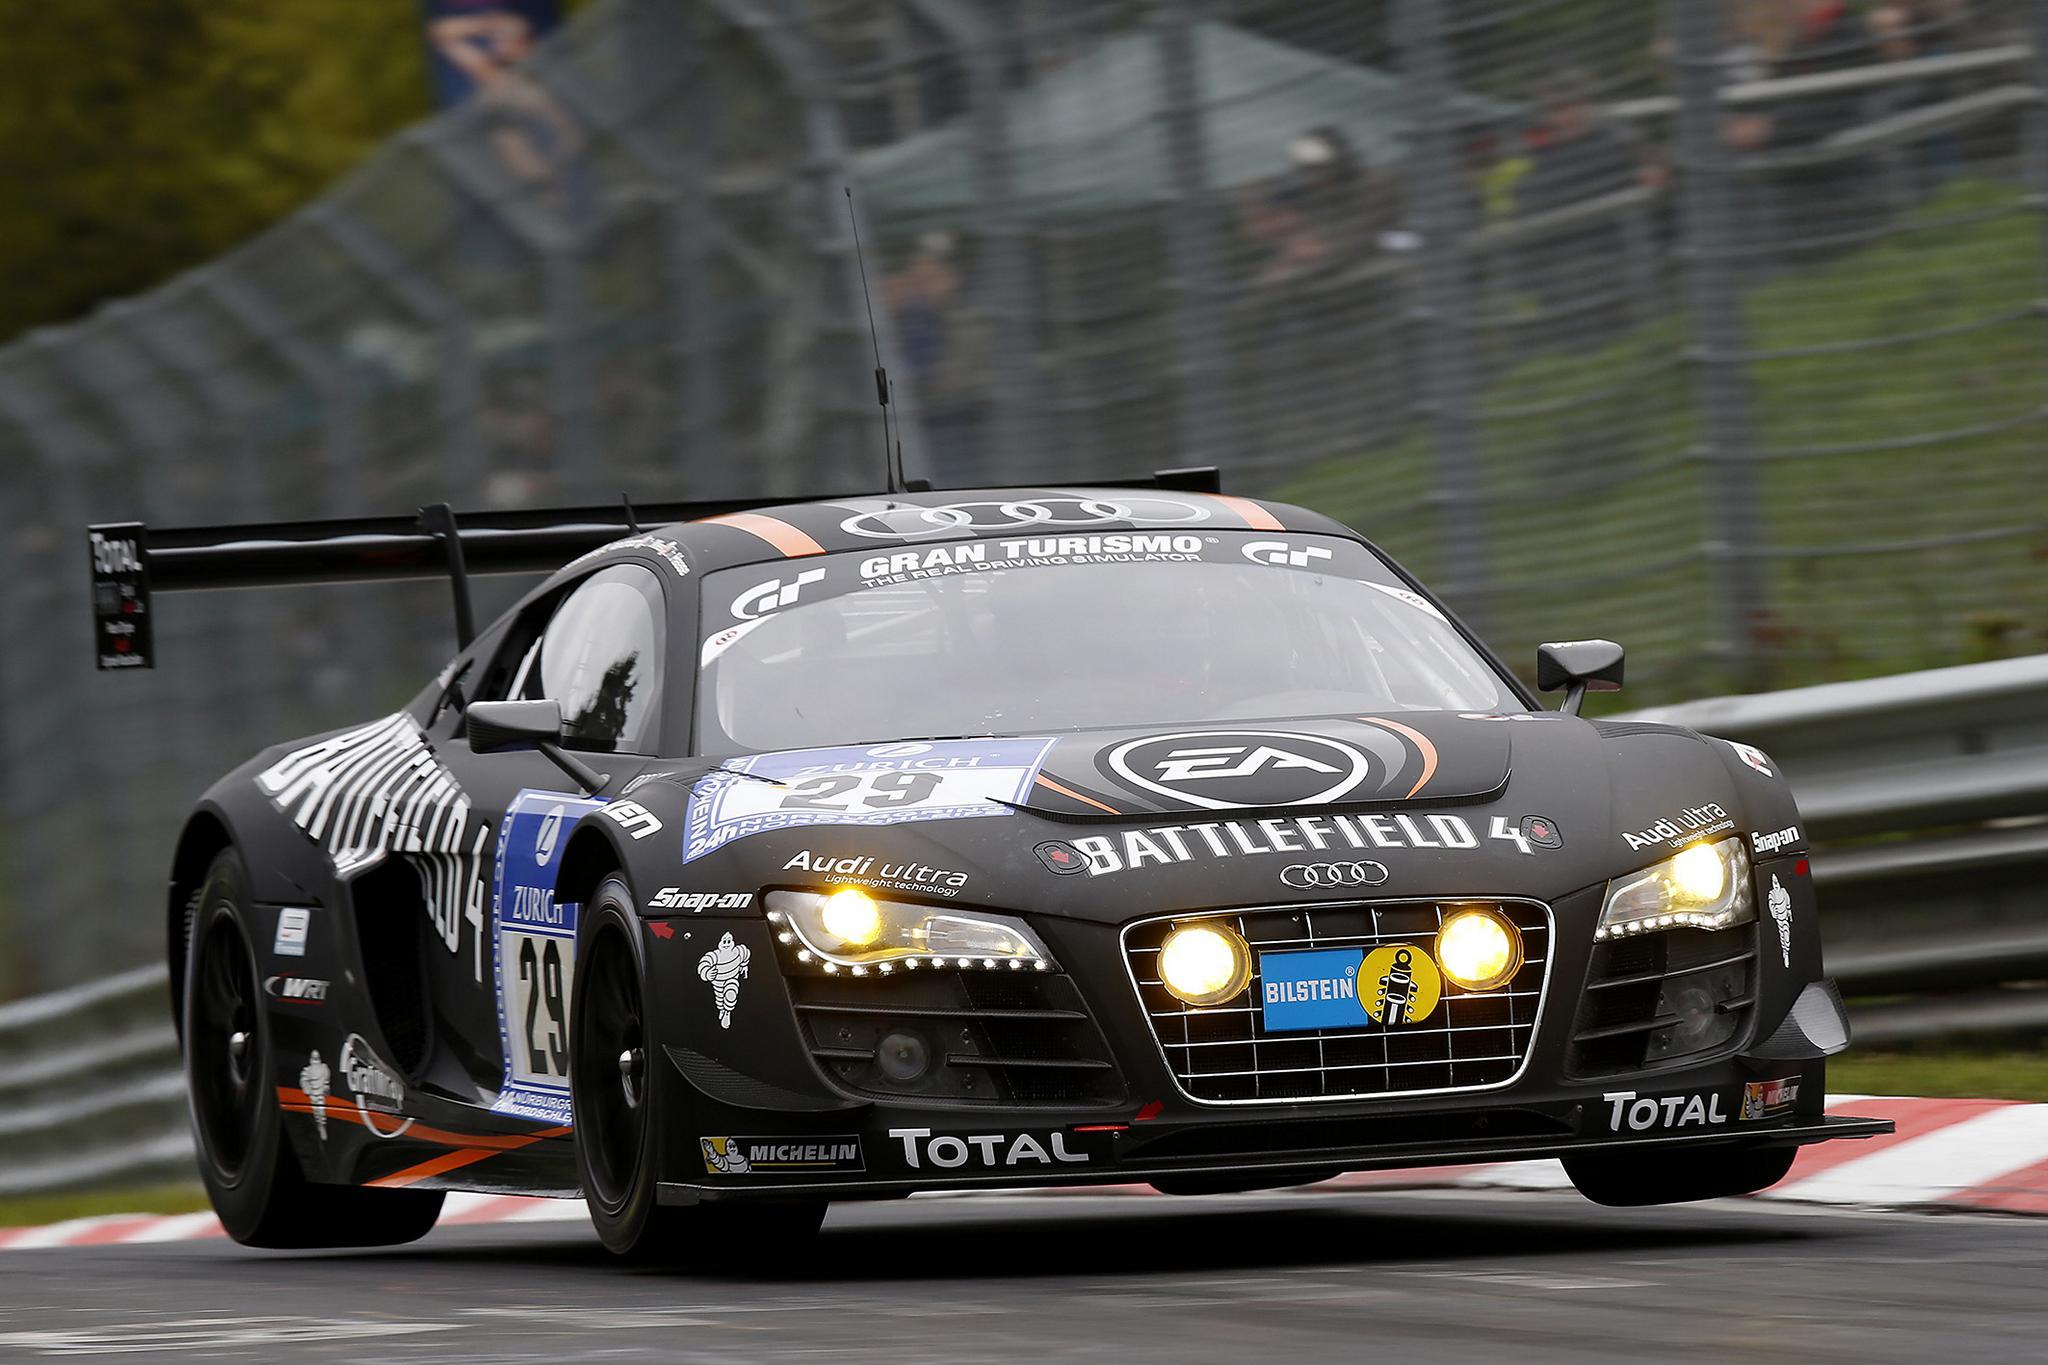 24h Rennen Kurzanalyse N 252 Rburgring 2013 Racingblog